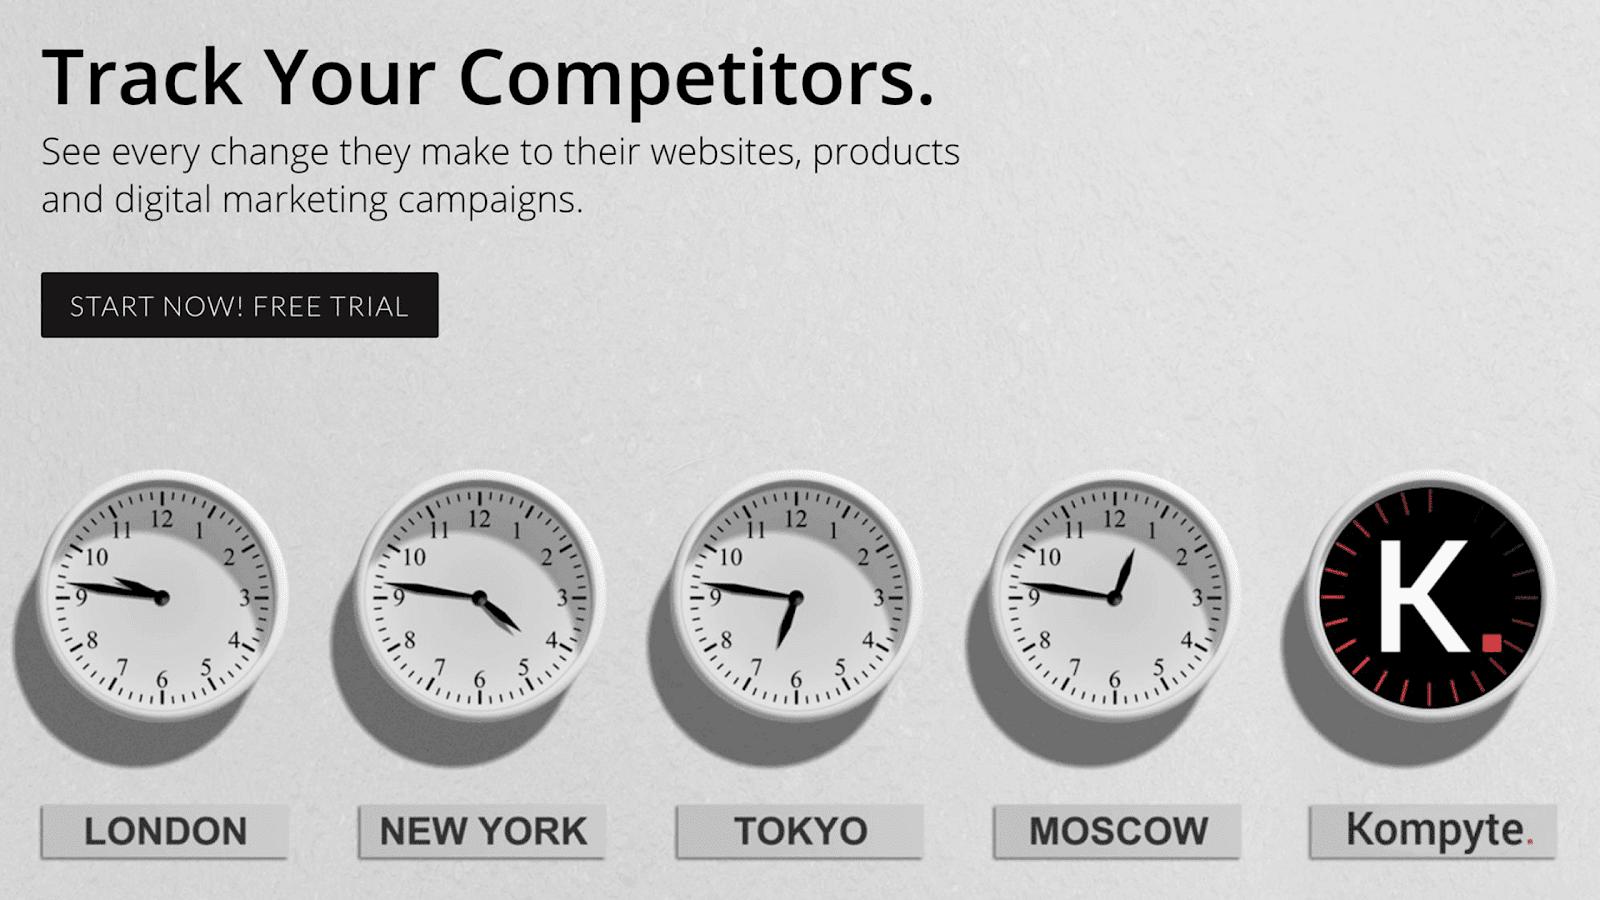 Kompyte competitor tracking tool